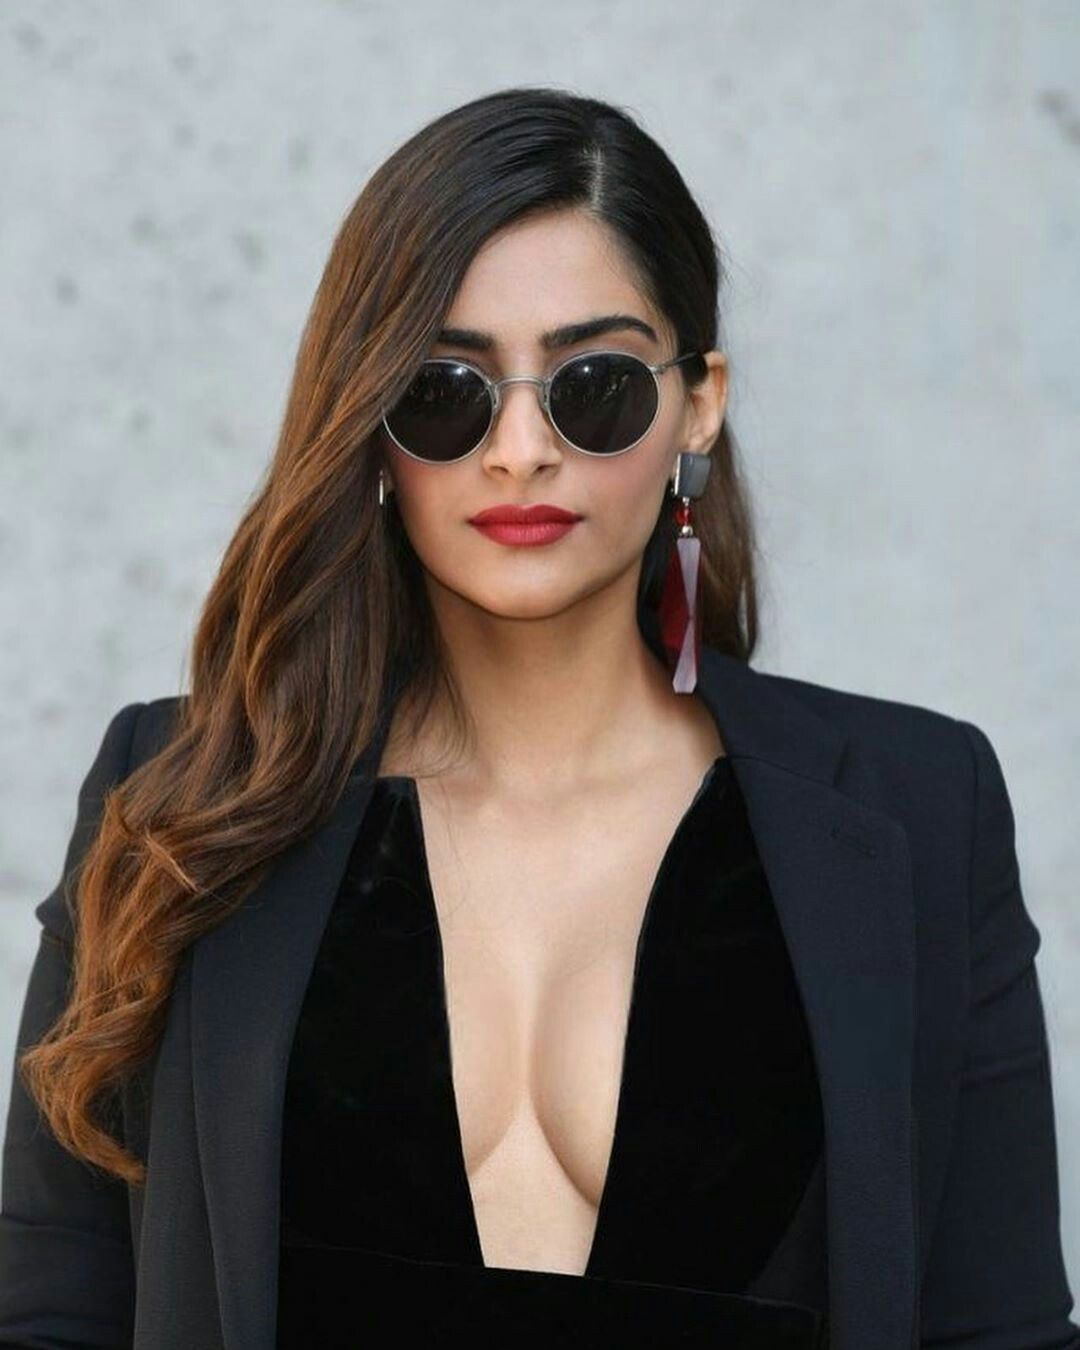 #sonamkapoor #bollywoodactress #Bollywood #hotactress